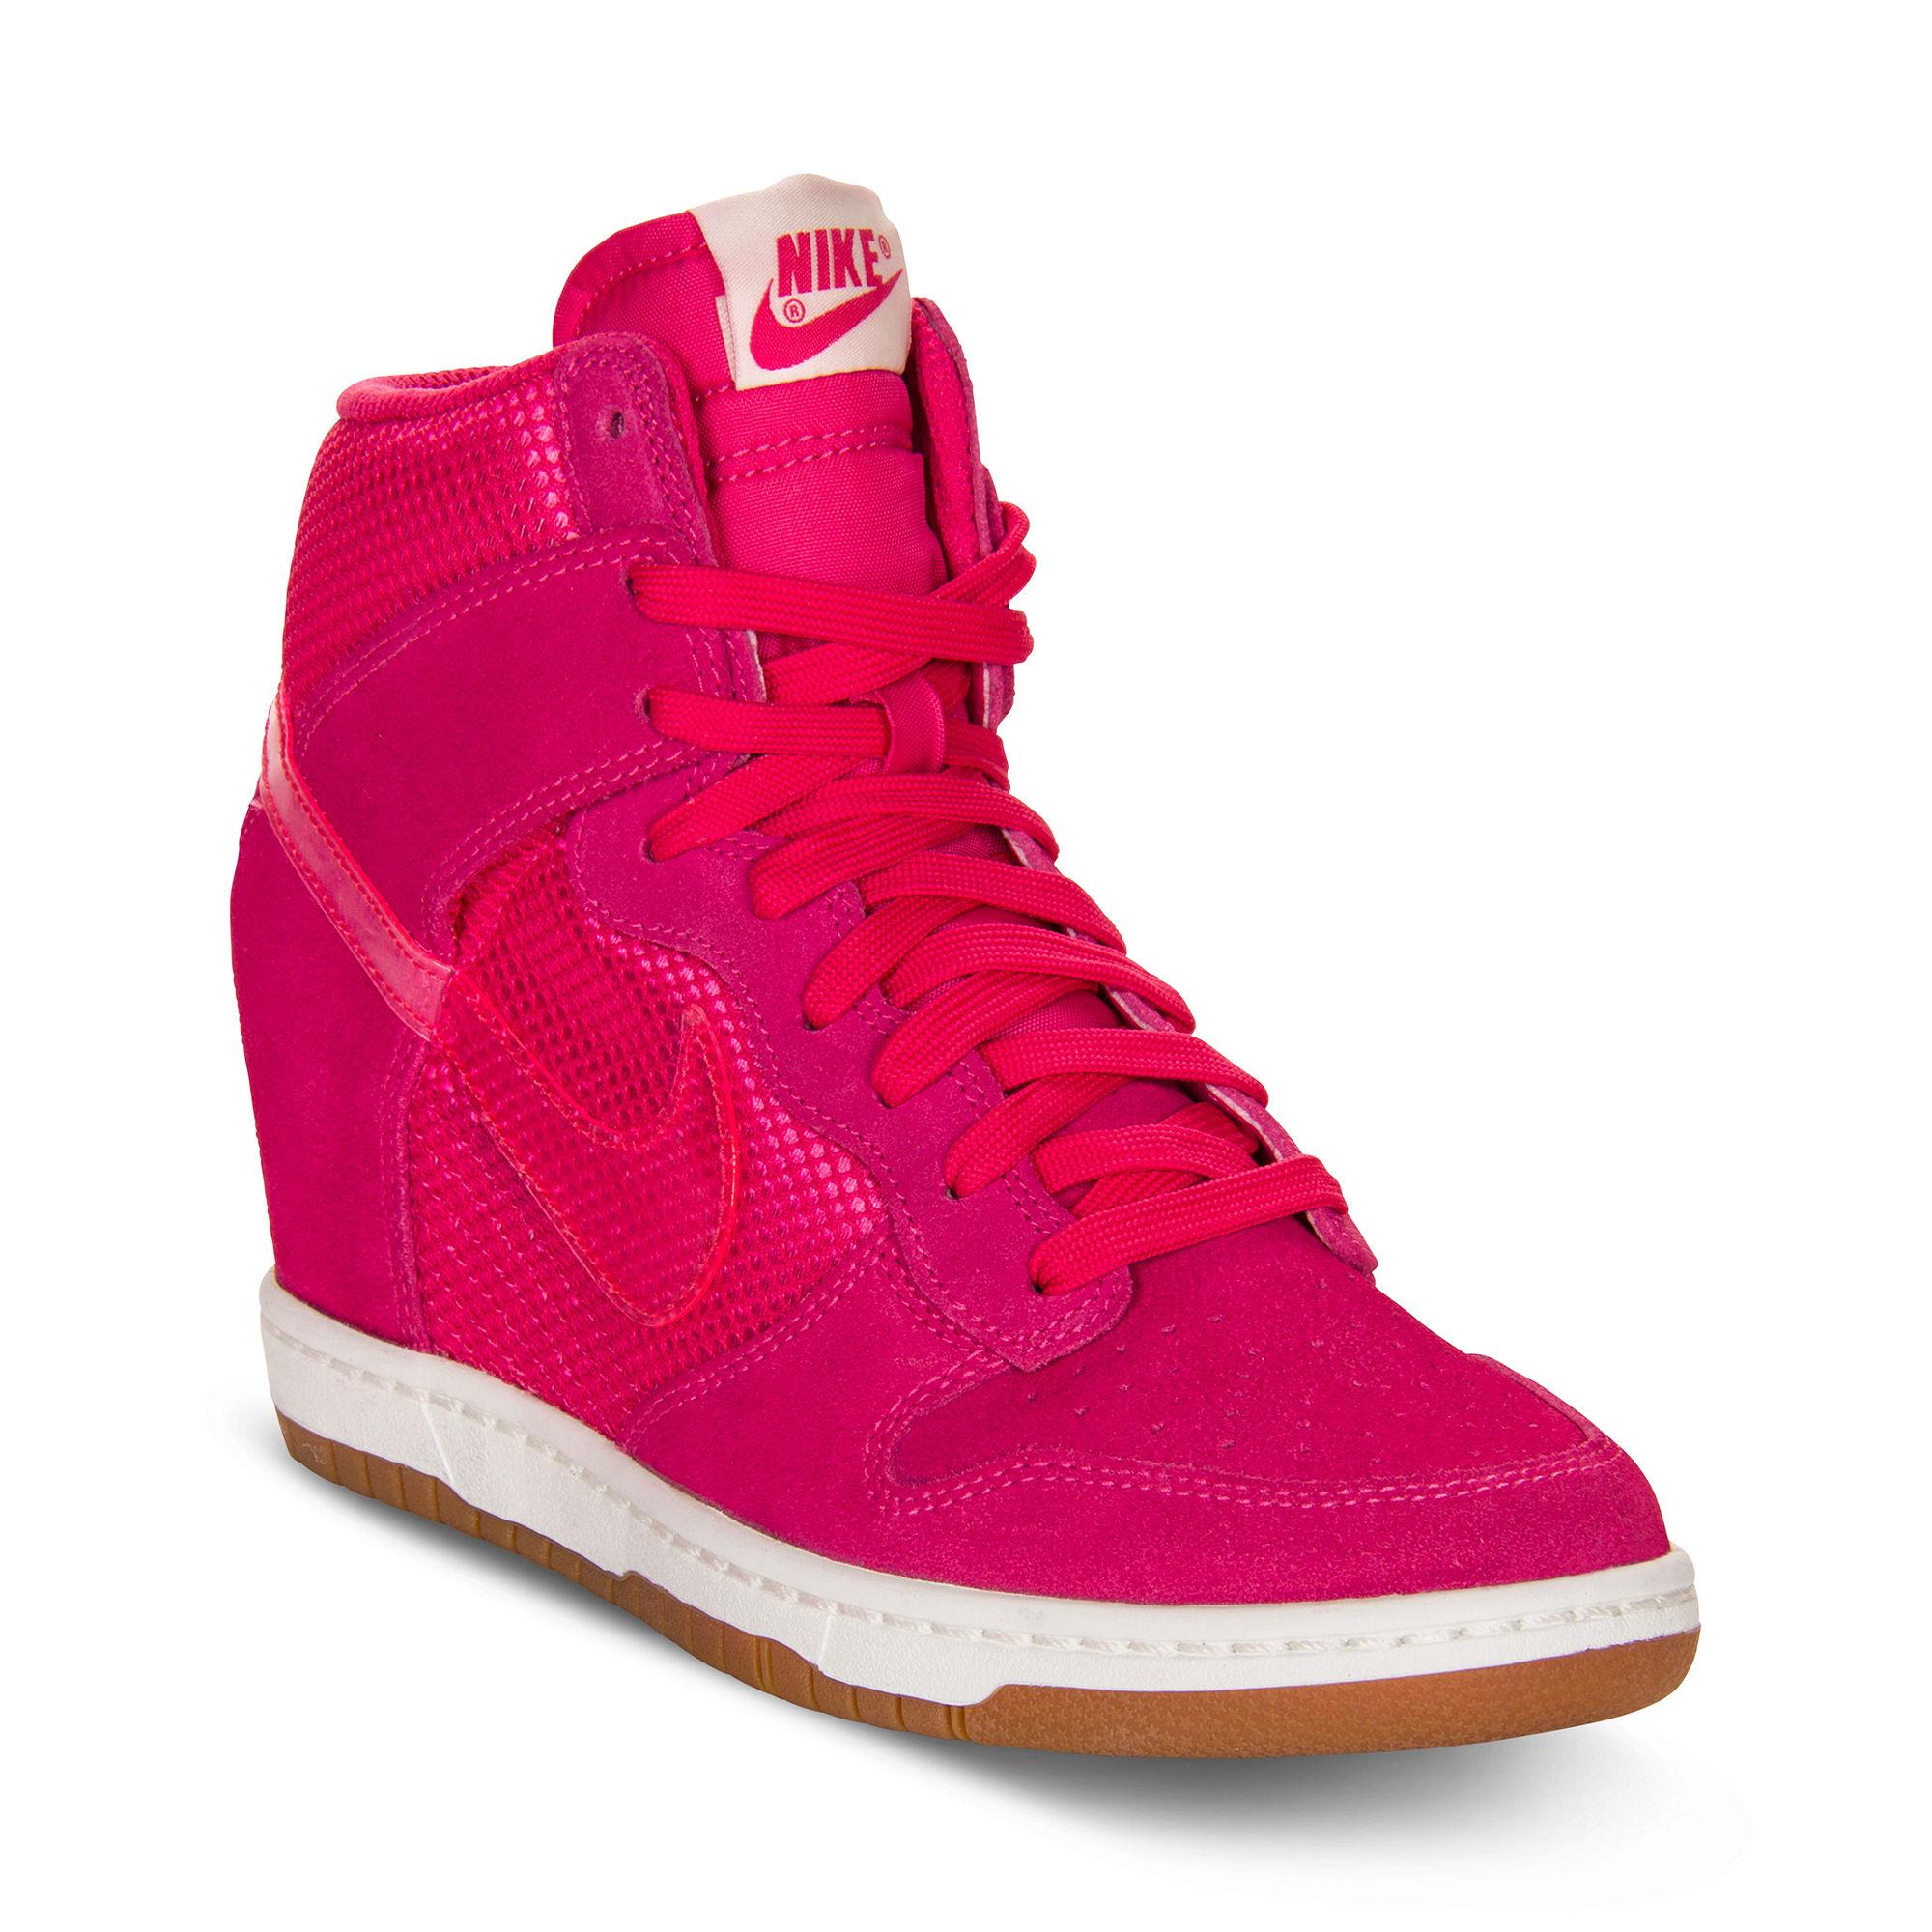 nike dunk sky hi sneakers in pink pink force lyst. Black Bedroom Furniture Sets. Home Design Ideas